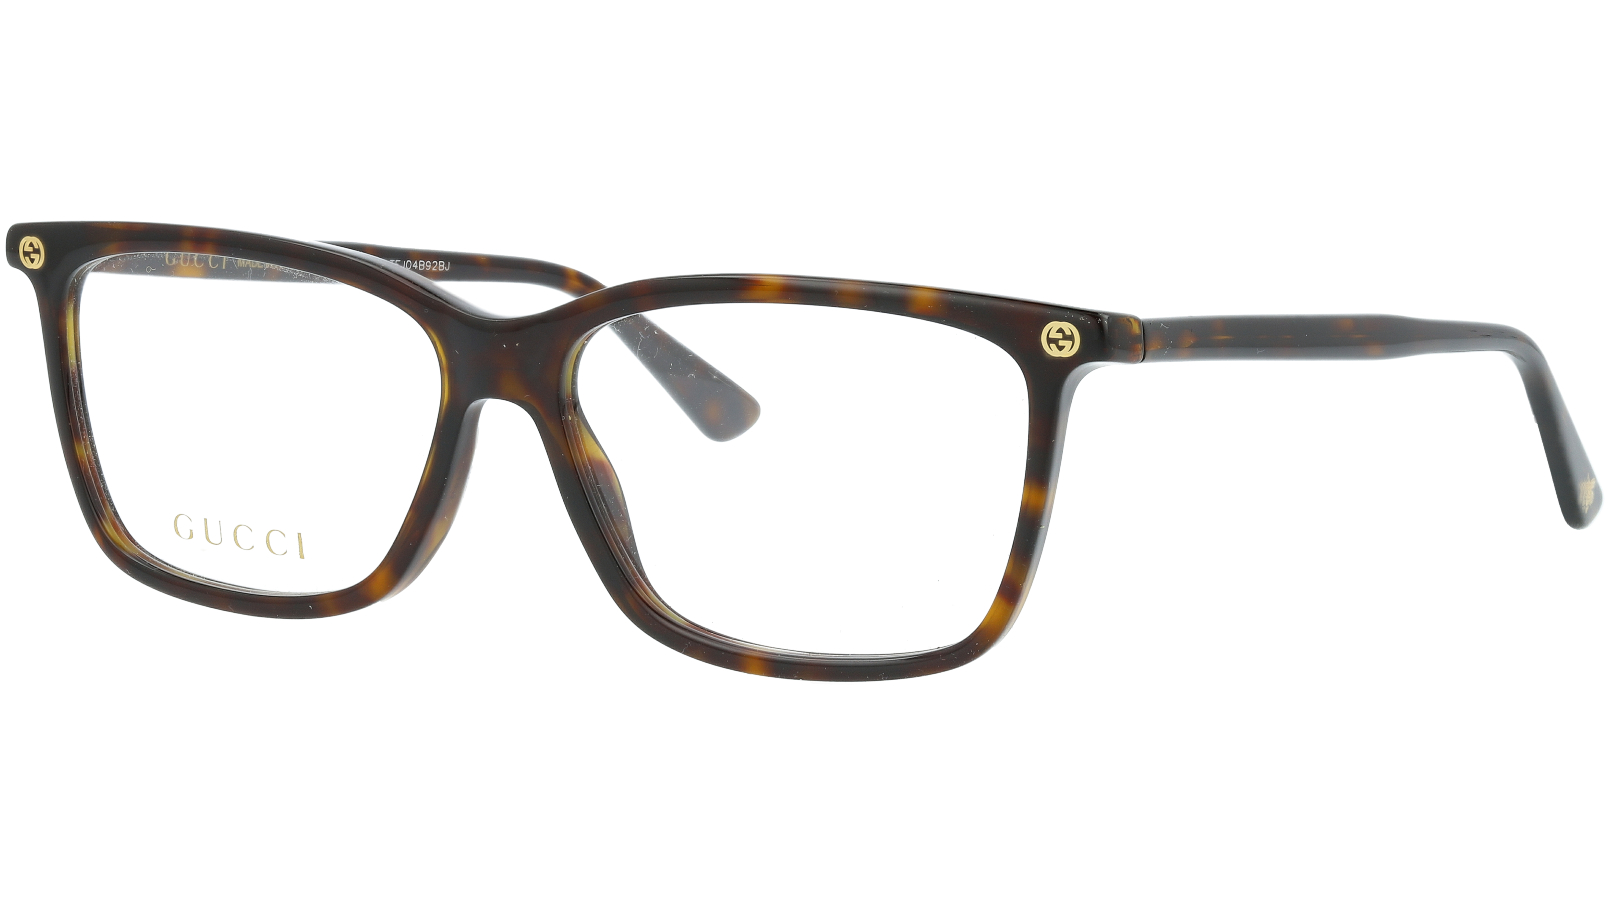 GUCCI GG0094O 007 54 AVANA Glasses